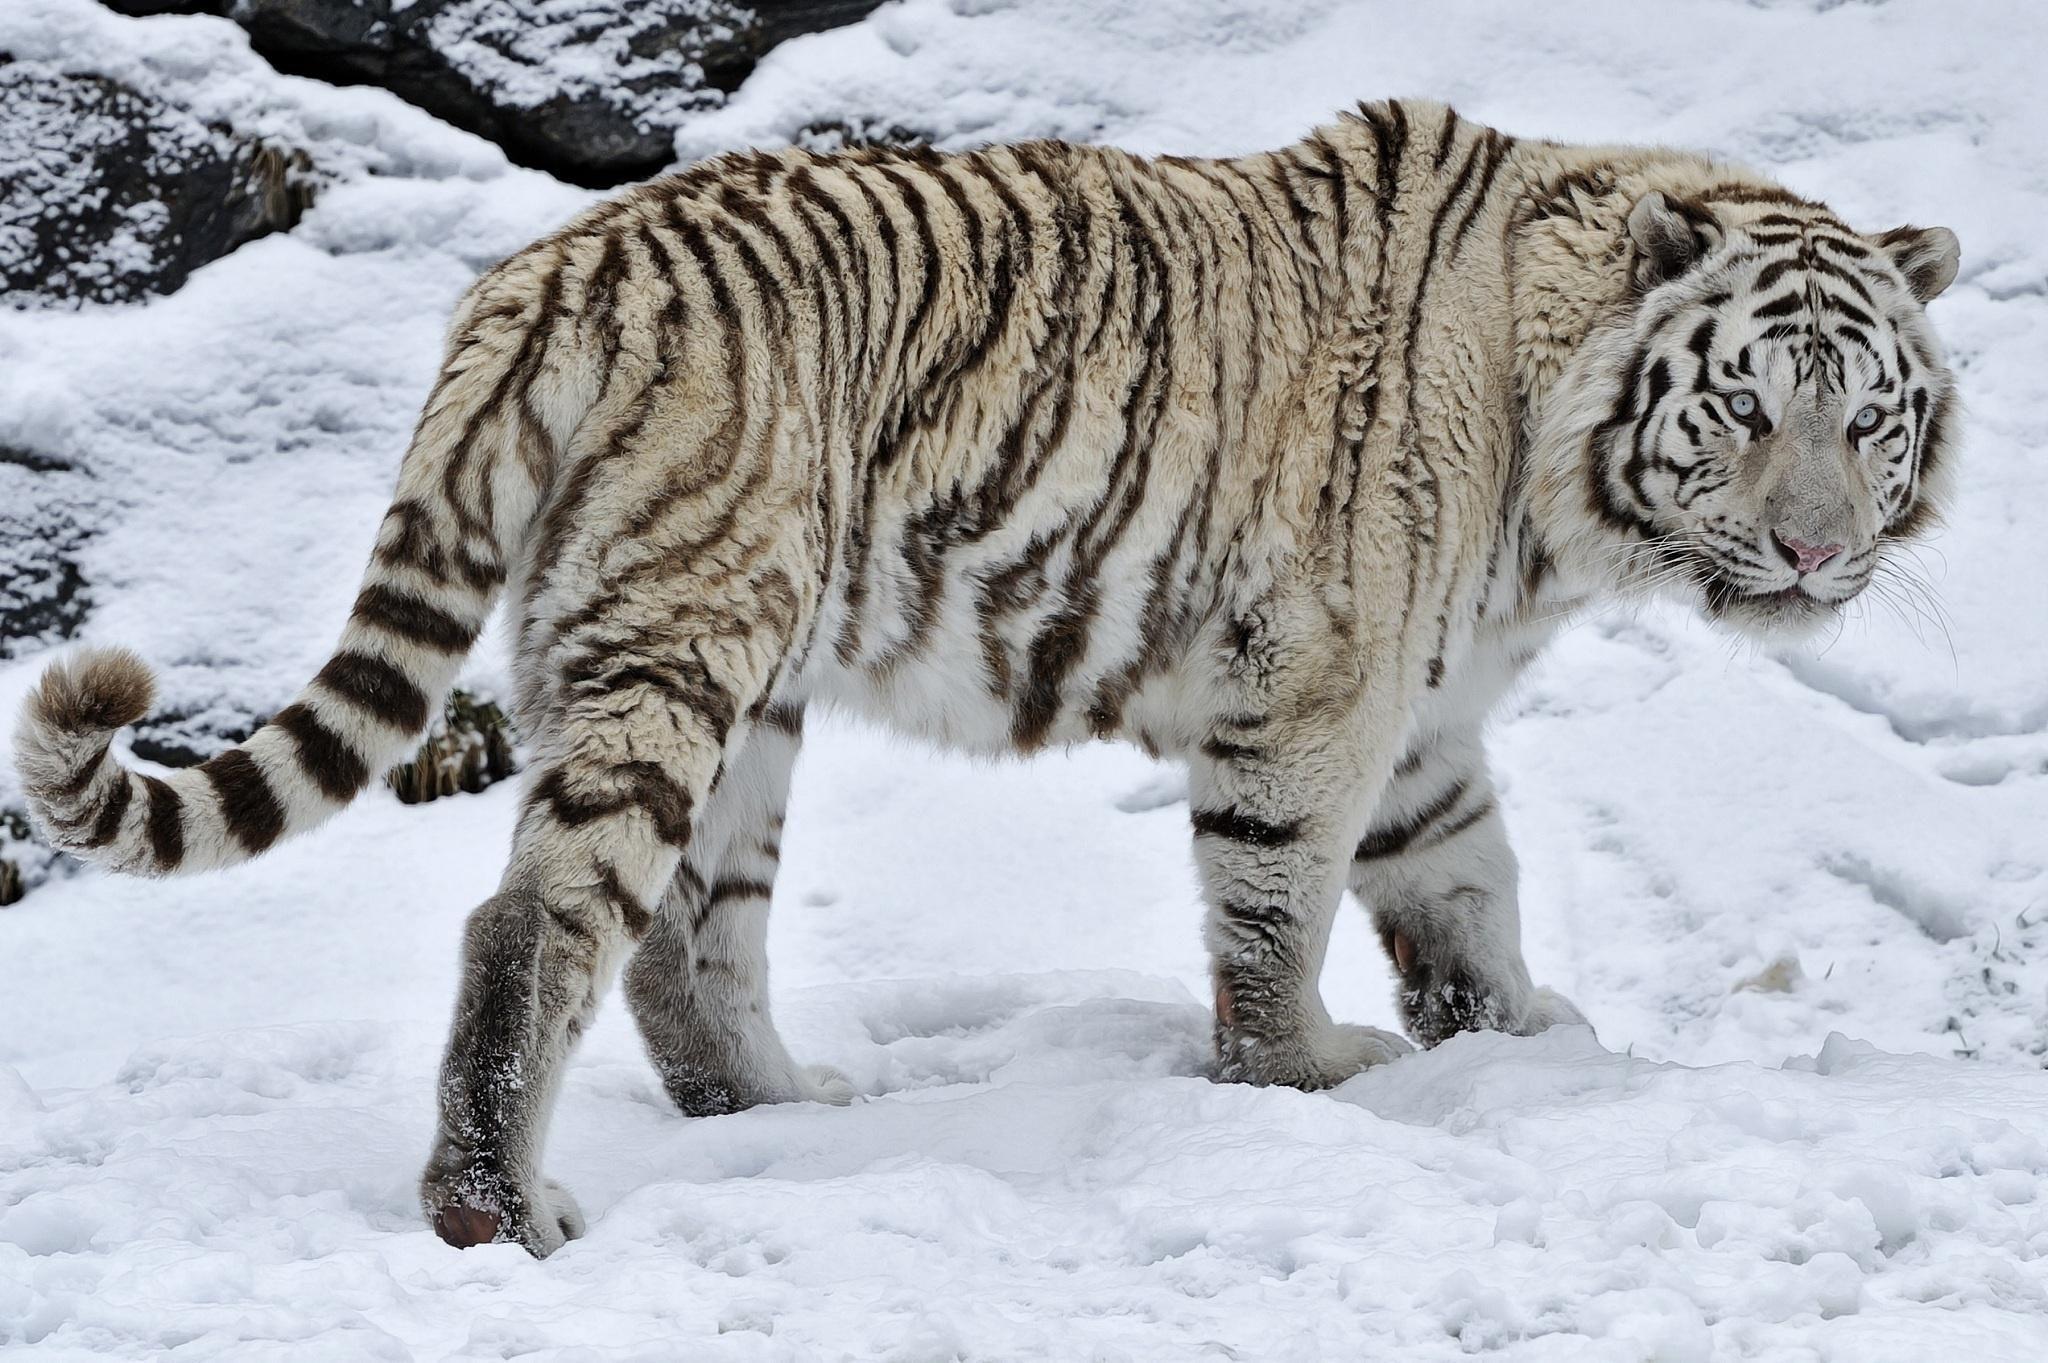 Hd White Tiger Wild Cat Snow Winter High Resolution Wallpaper Snow Tiger White Tiger Tiger